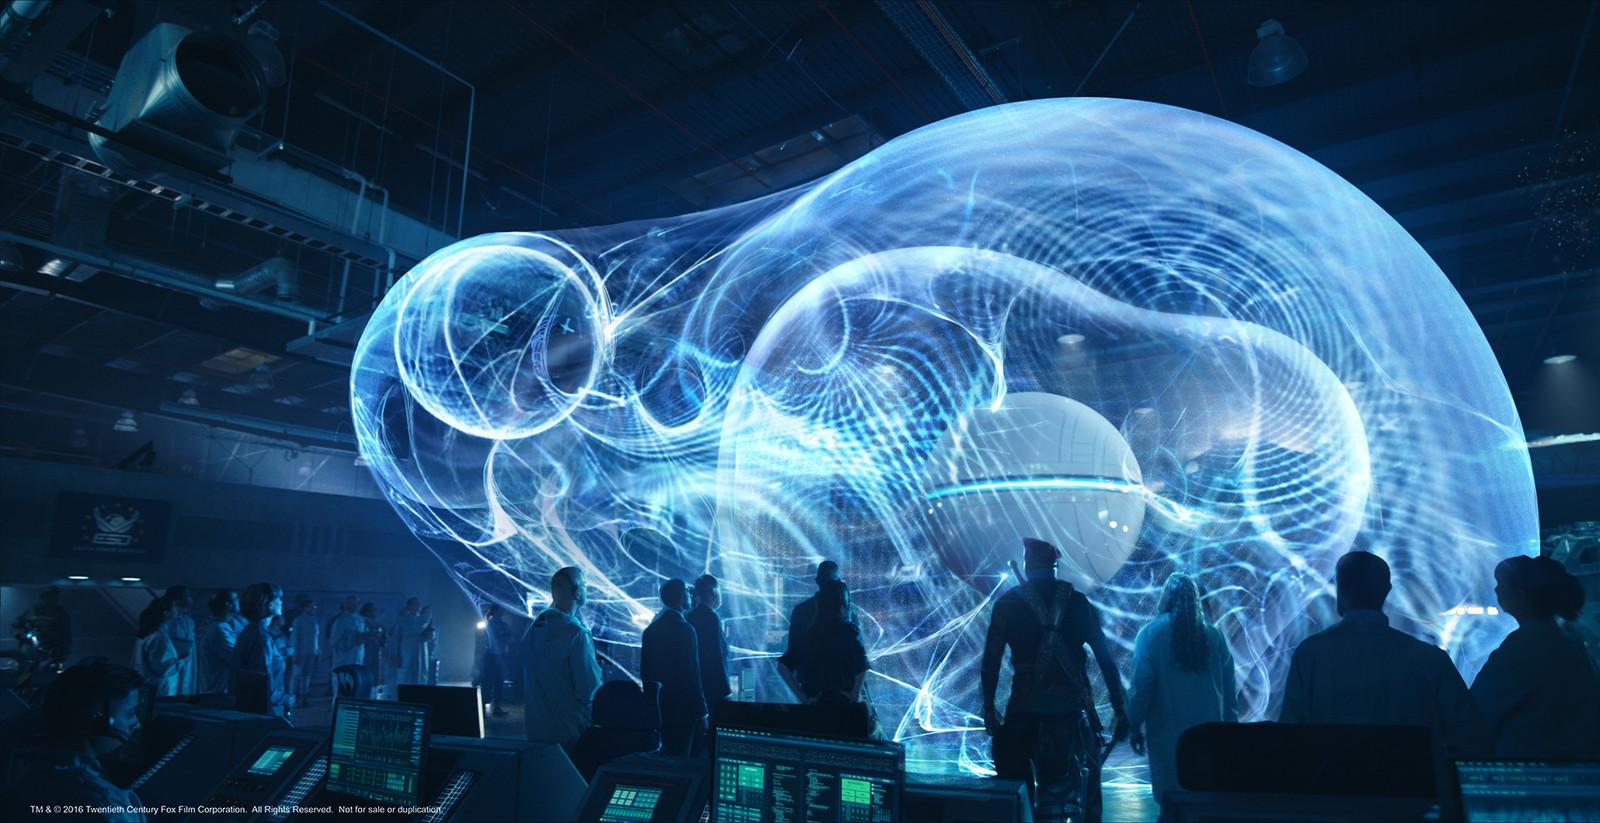 AI Orb hologram, permutations. 7 of 8